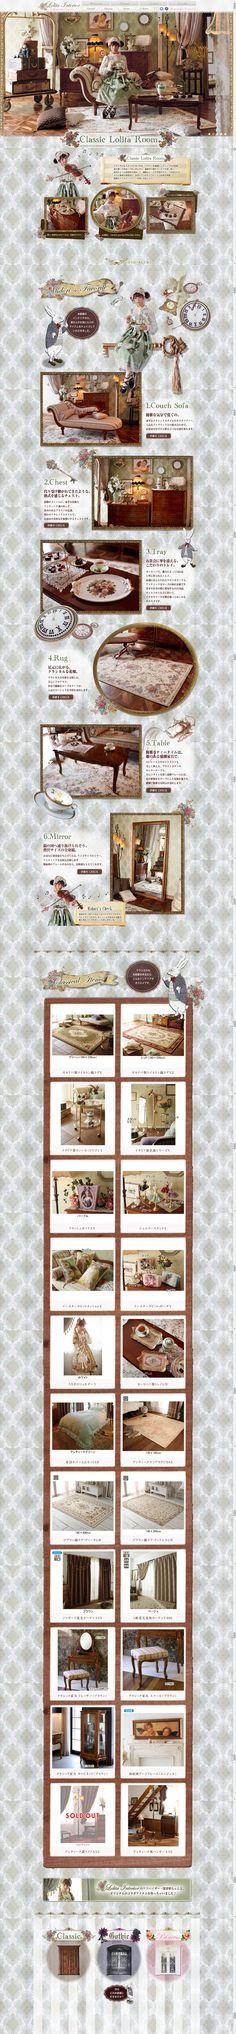 http://www.romapri.com/lolita/classic/index.html